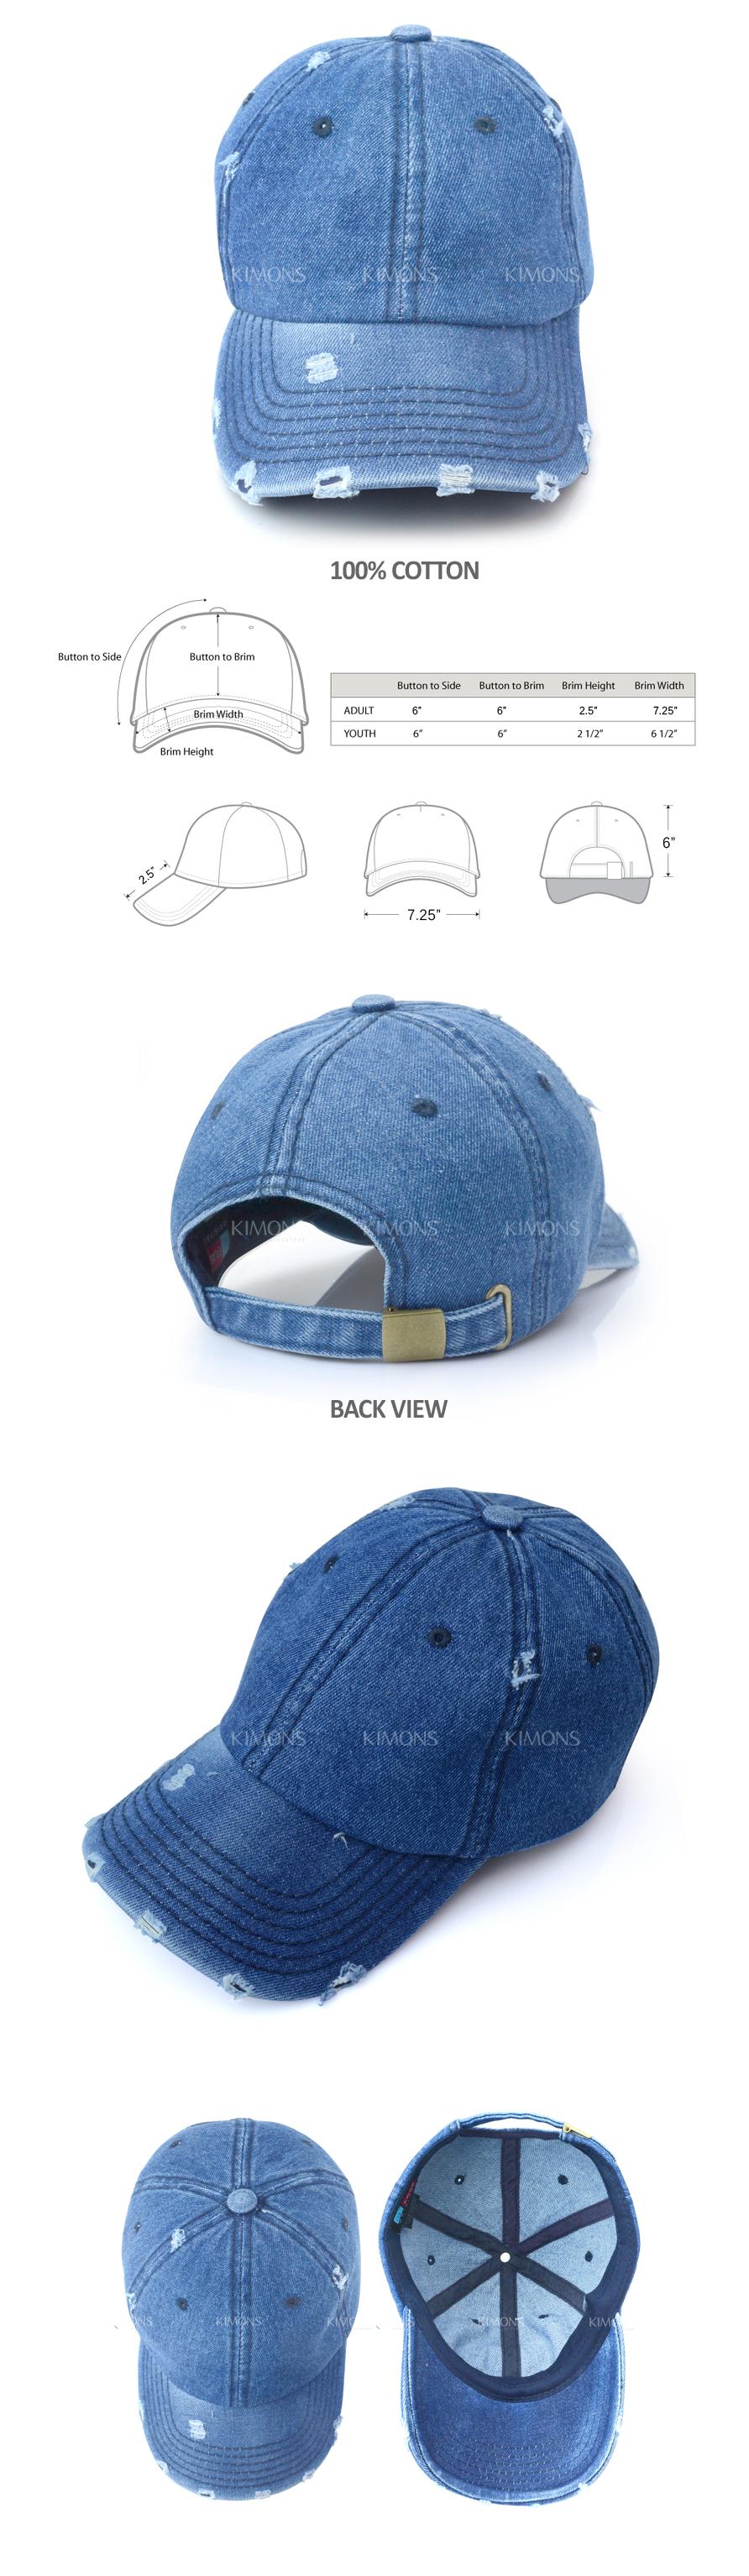 d133600f566 Vintage Distressed 100% Cotton Solid Polo Denim Baseball Cap Hat ...